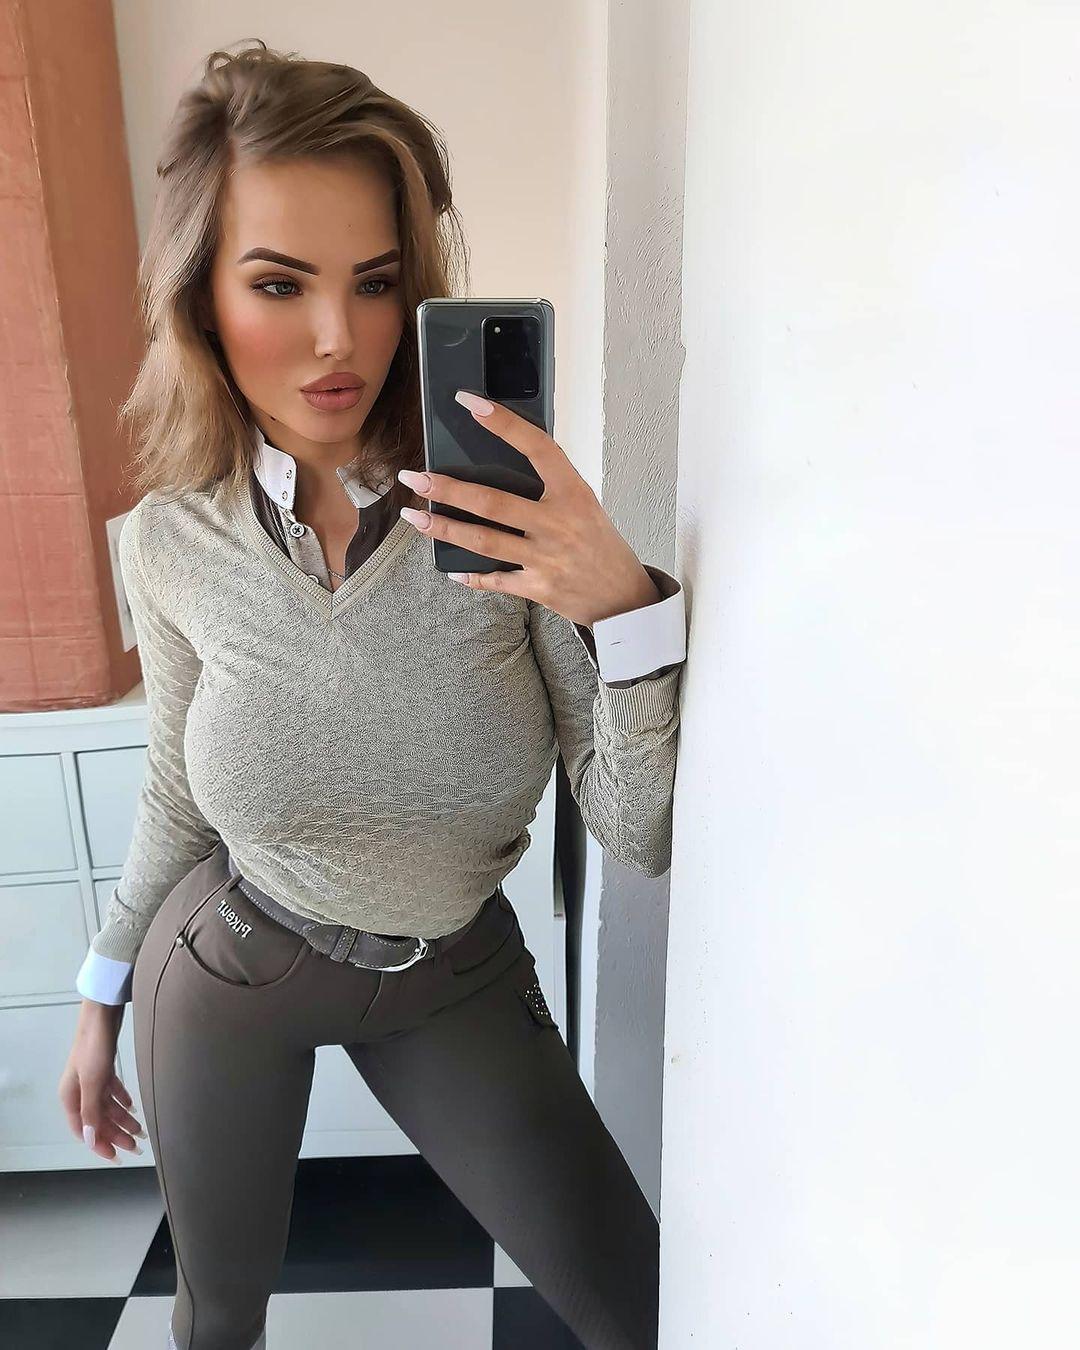 Elizaveta-Berejnaya-Wallpapers-Insta-Fit-Bio-Miss-elizabeth-sol-Wallpapers-Insta-Fit-Bio-3